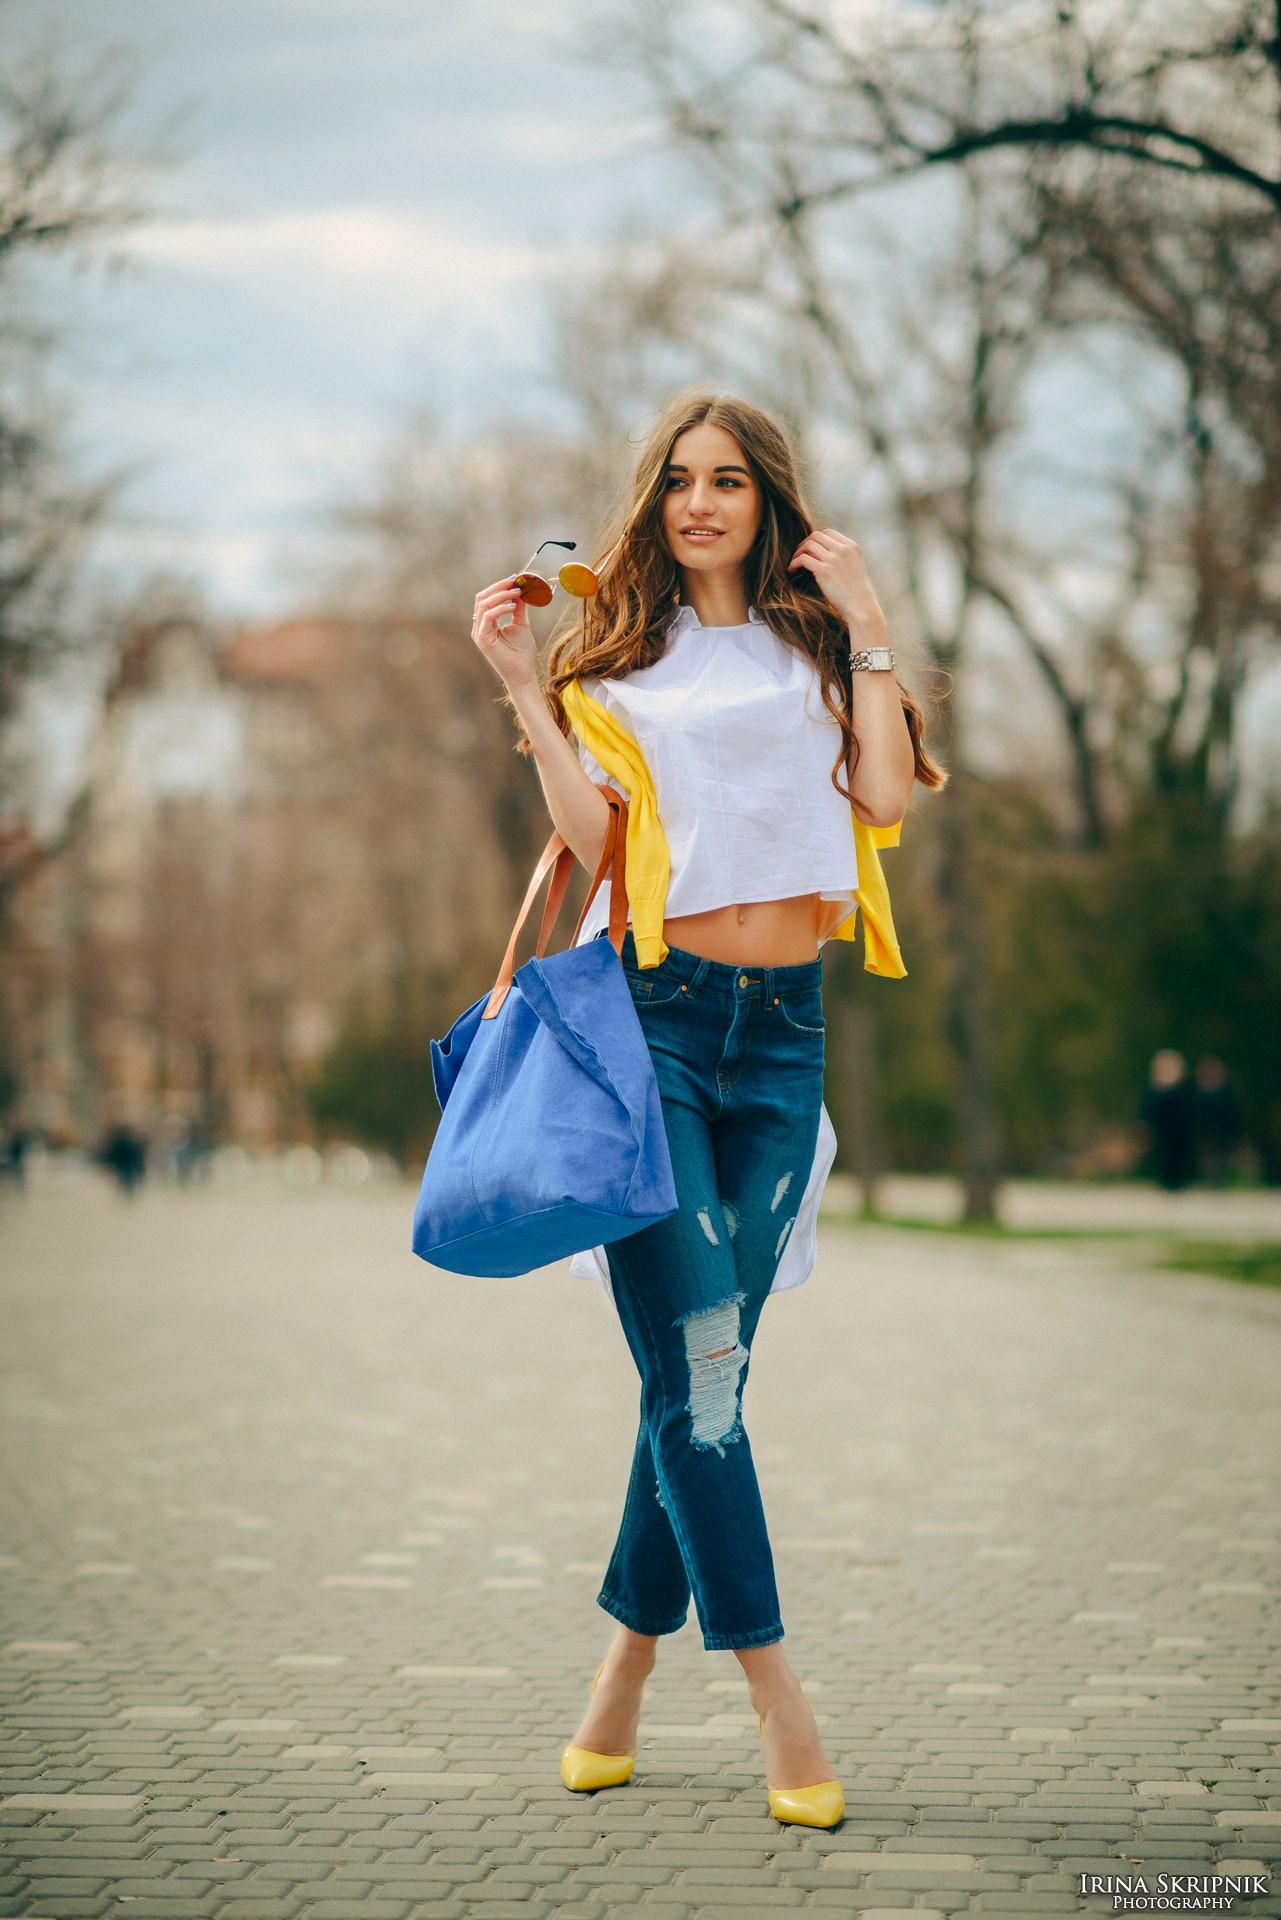 Irina Skripnik Photography 30072